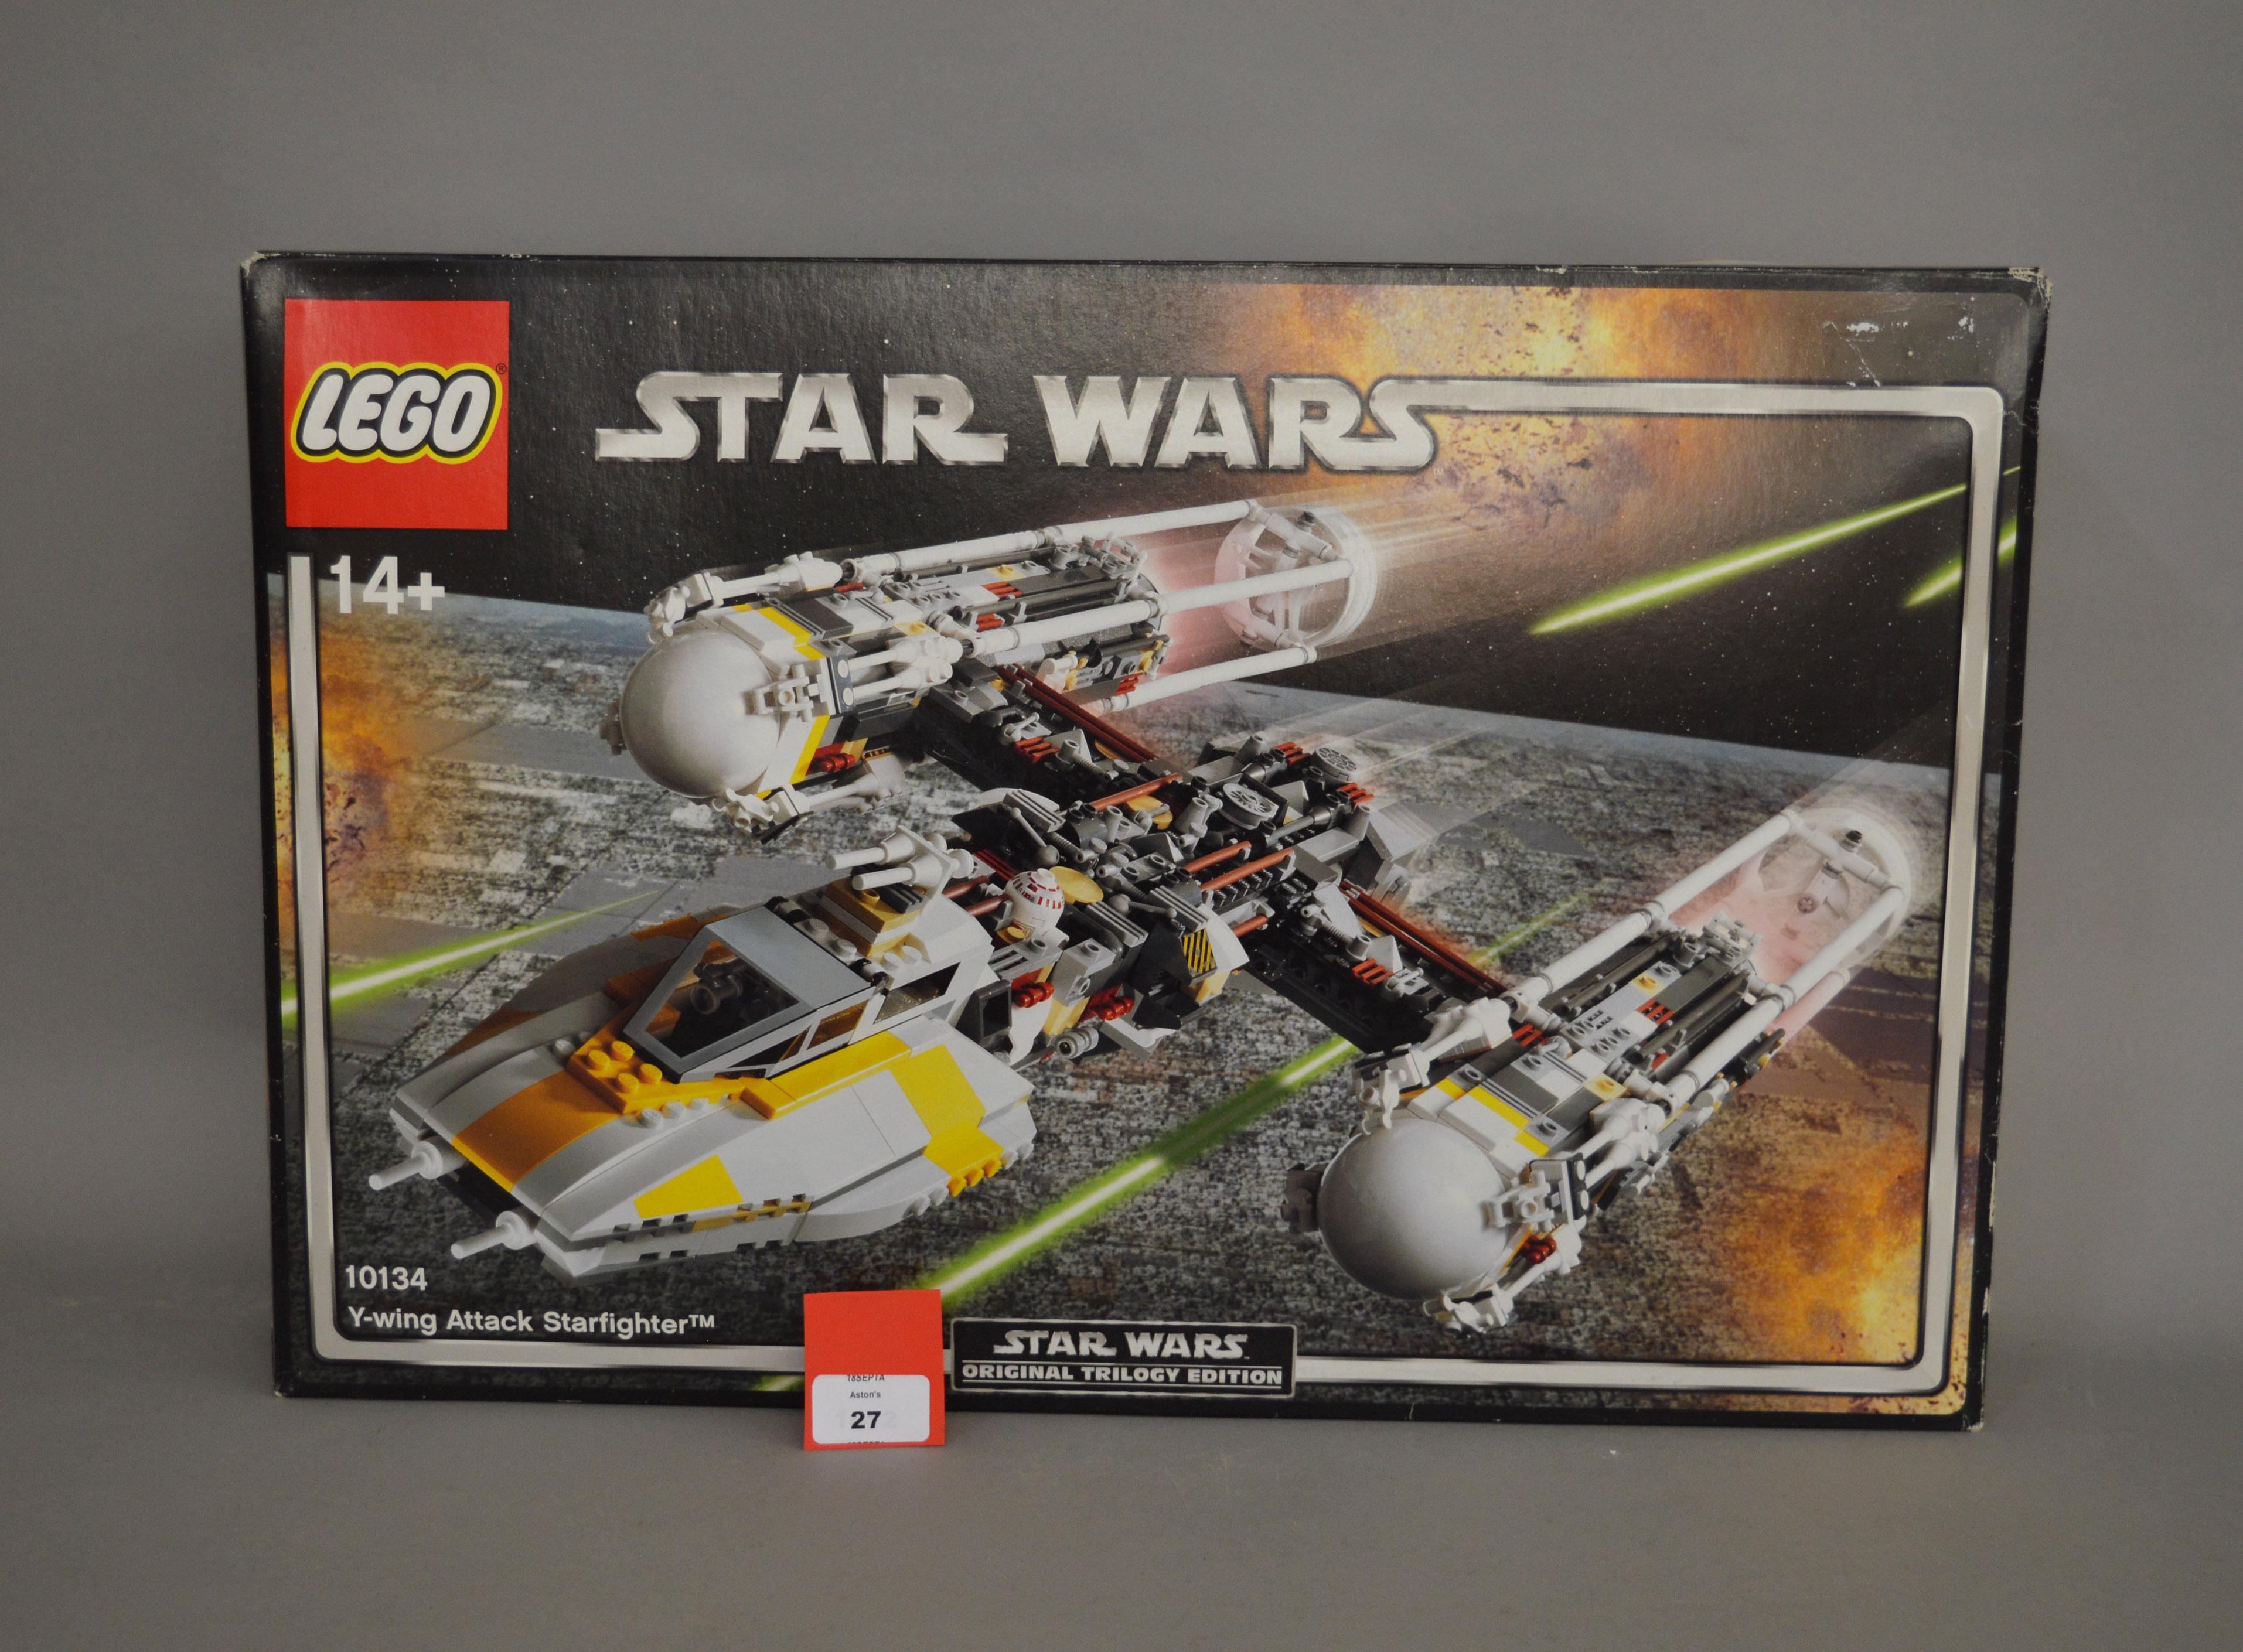 Lot 27 - Lego Star Wars Original Trilogy Edition 10134 Y-wing Attack Starfighter.